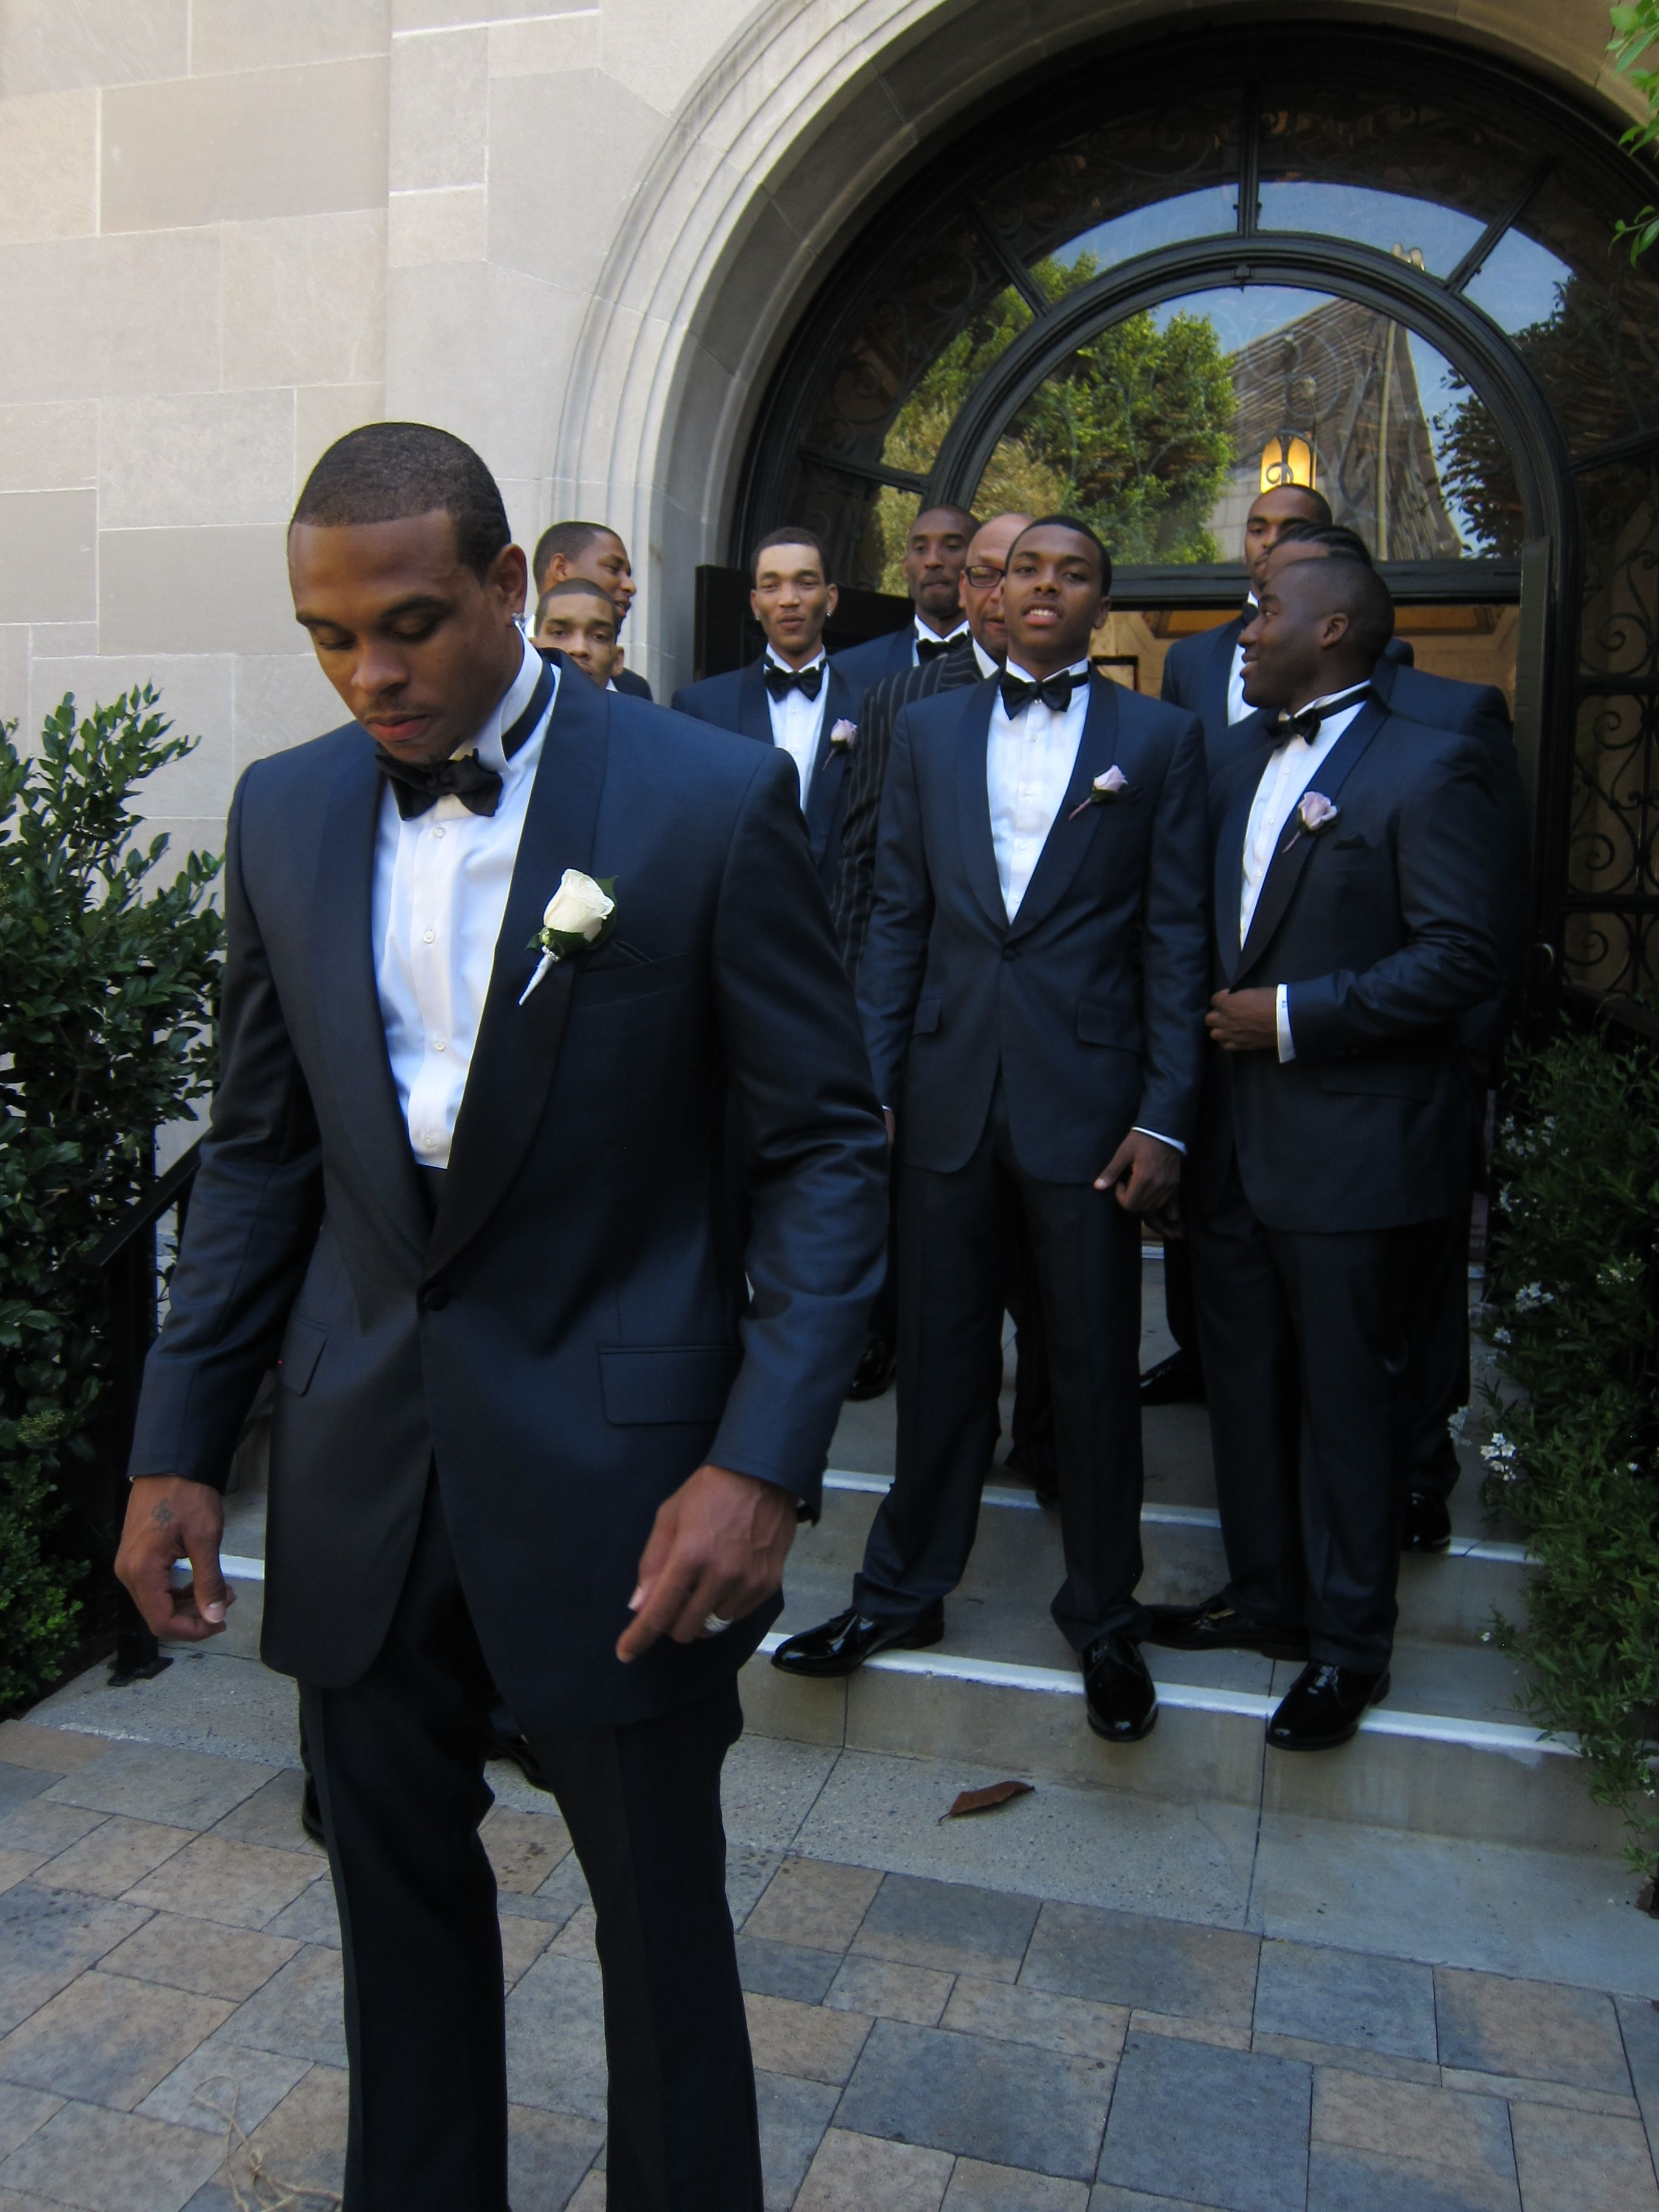 Wedding Styles Dark Blue Tuxedo